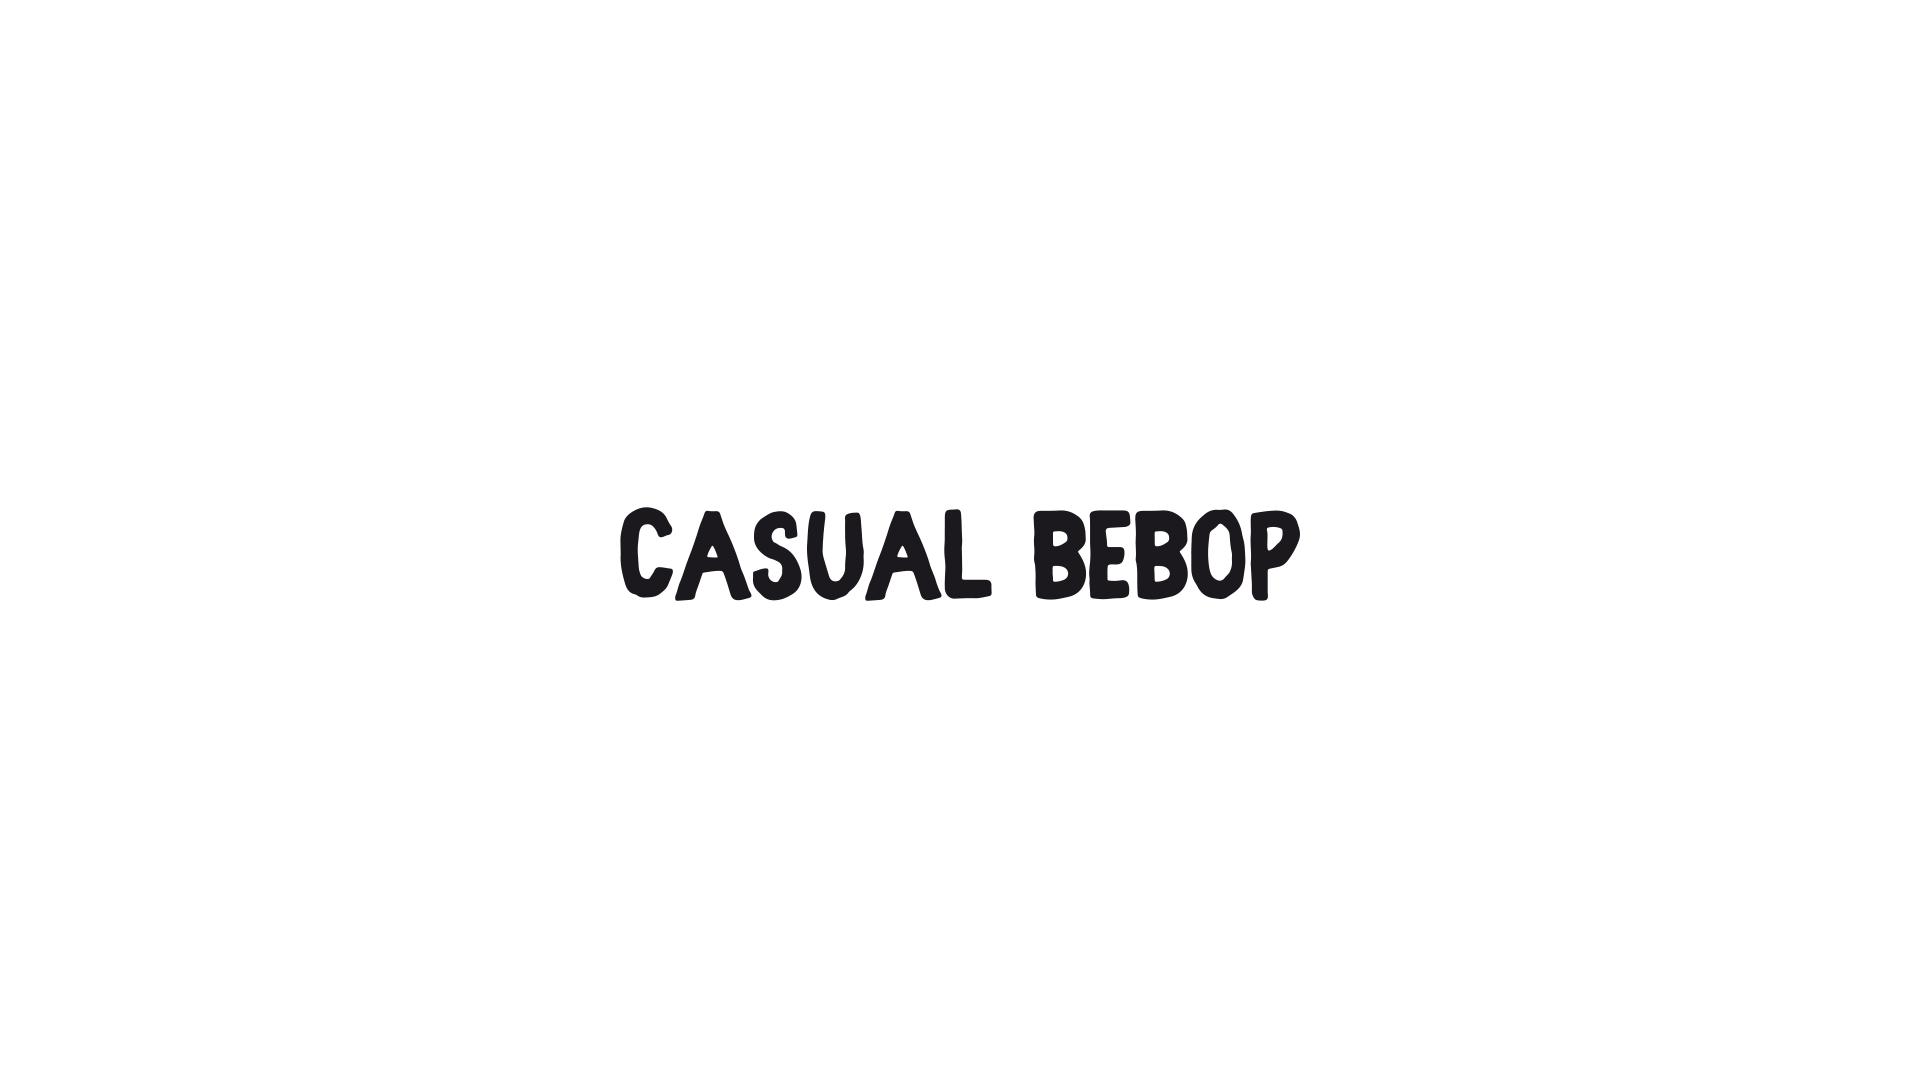 CasualBebop_Light_Logo_v2.png